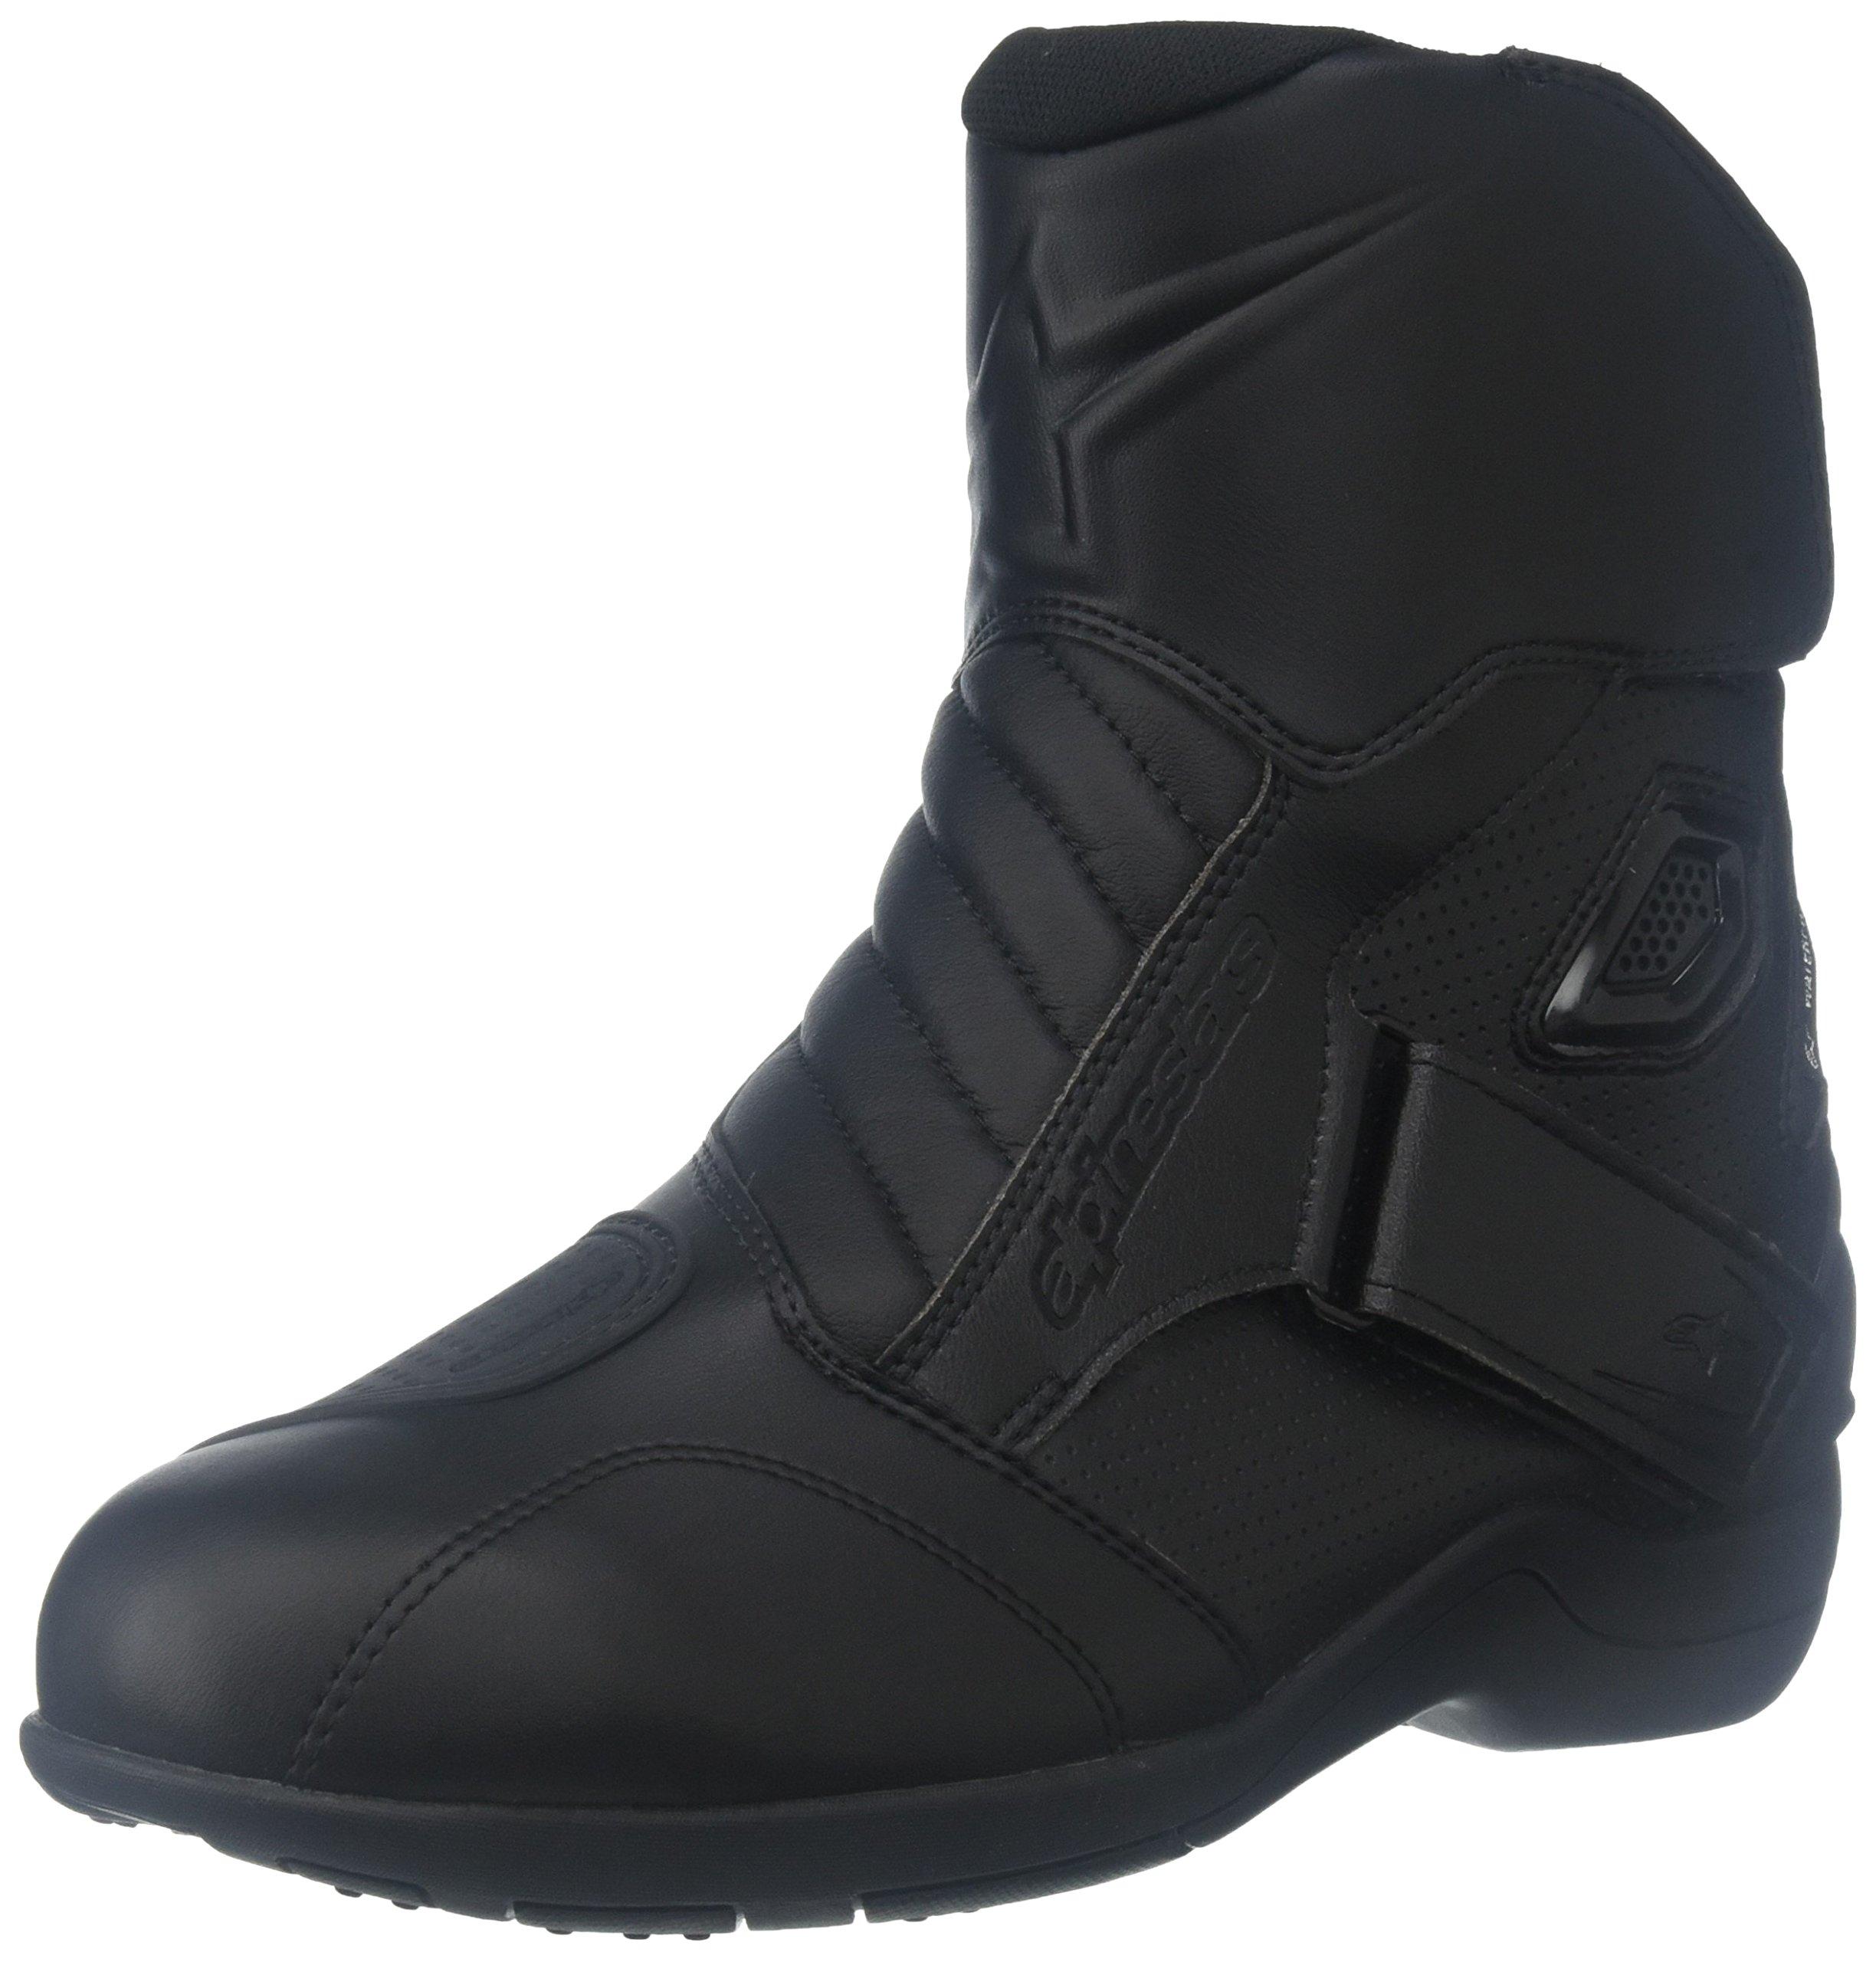 Alpinestars Gunner Waterproof Men's Street Motorcycle Boots (Black, EU Size 46)